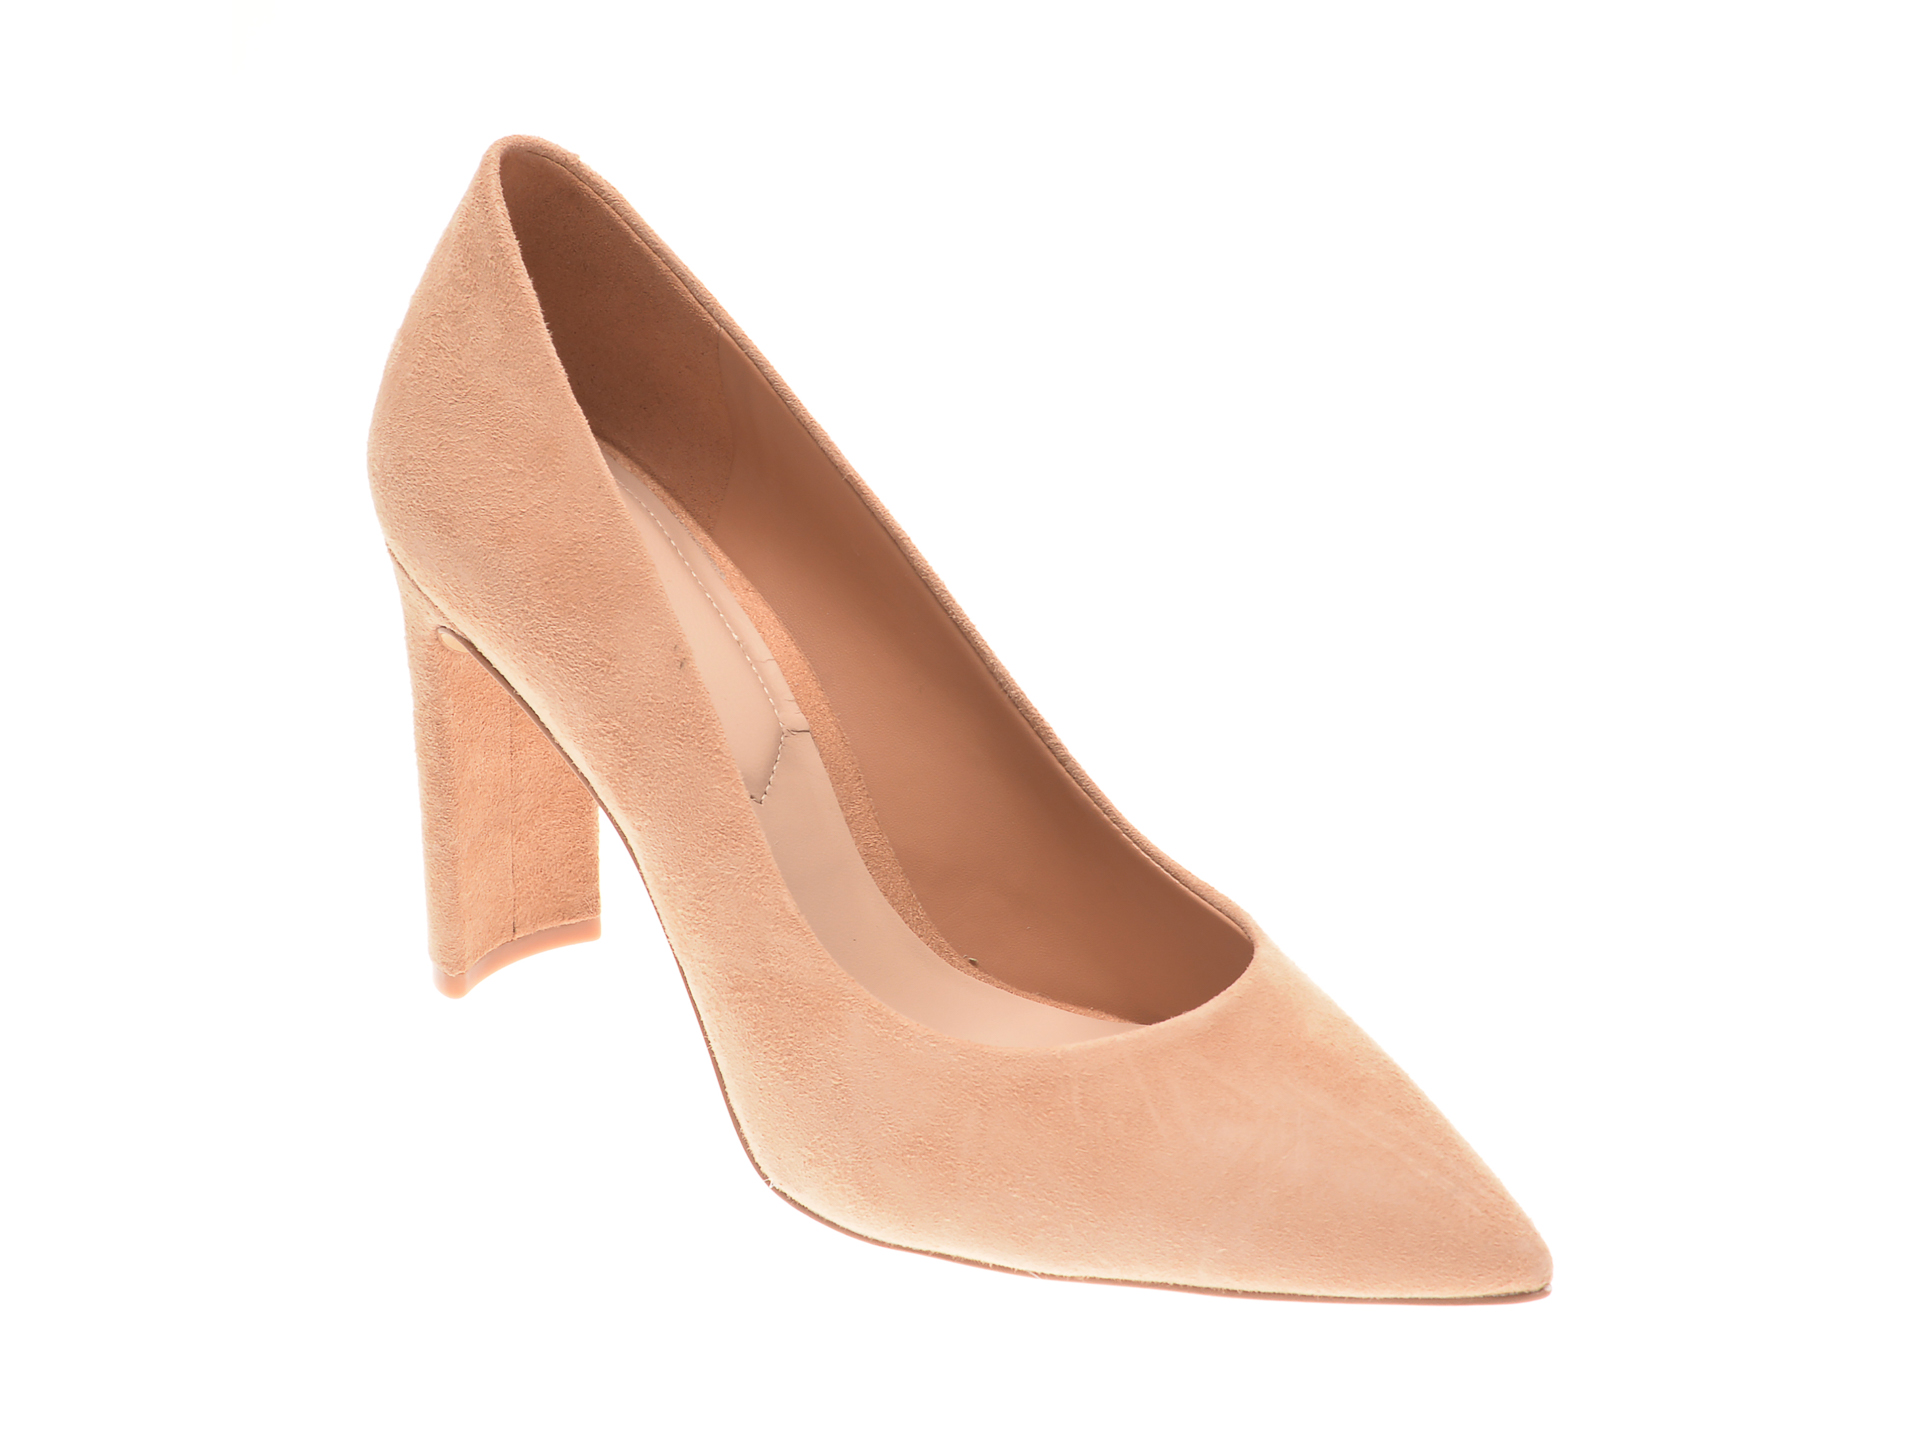 Pantofi ALDO nude, Febriclya260, din piele intoarsa imagine otter.ro 2021